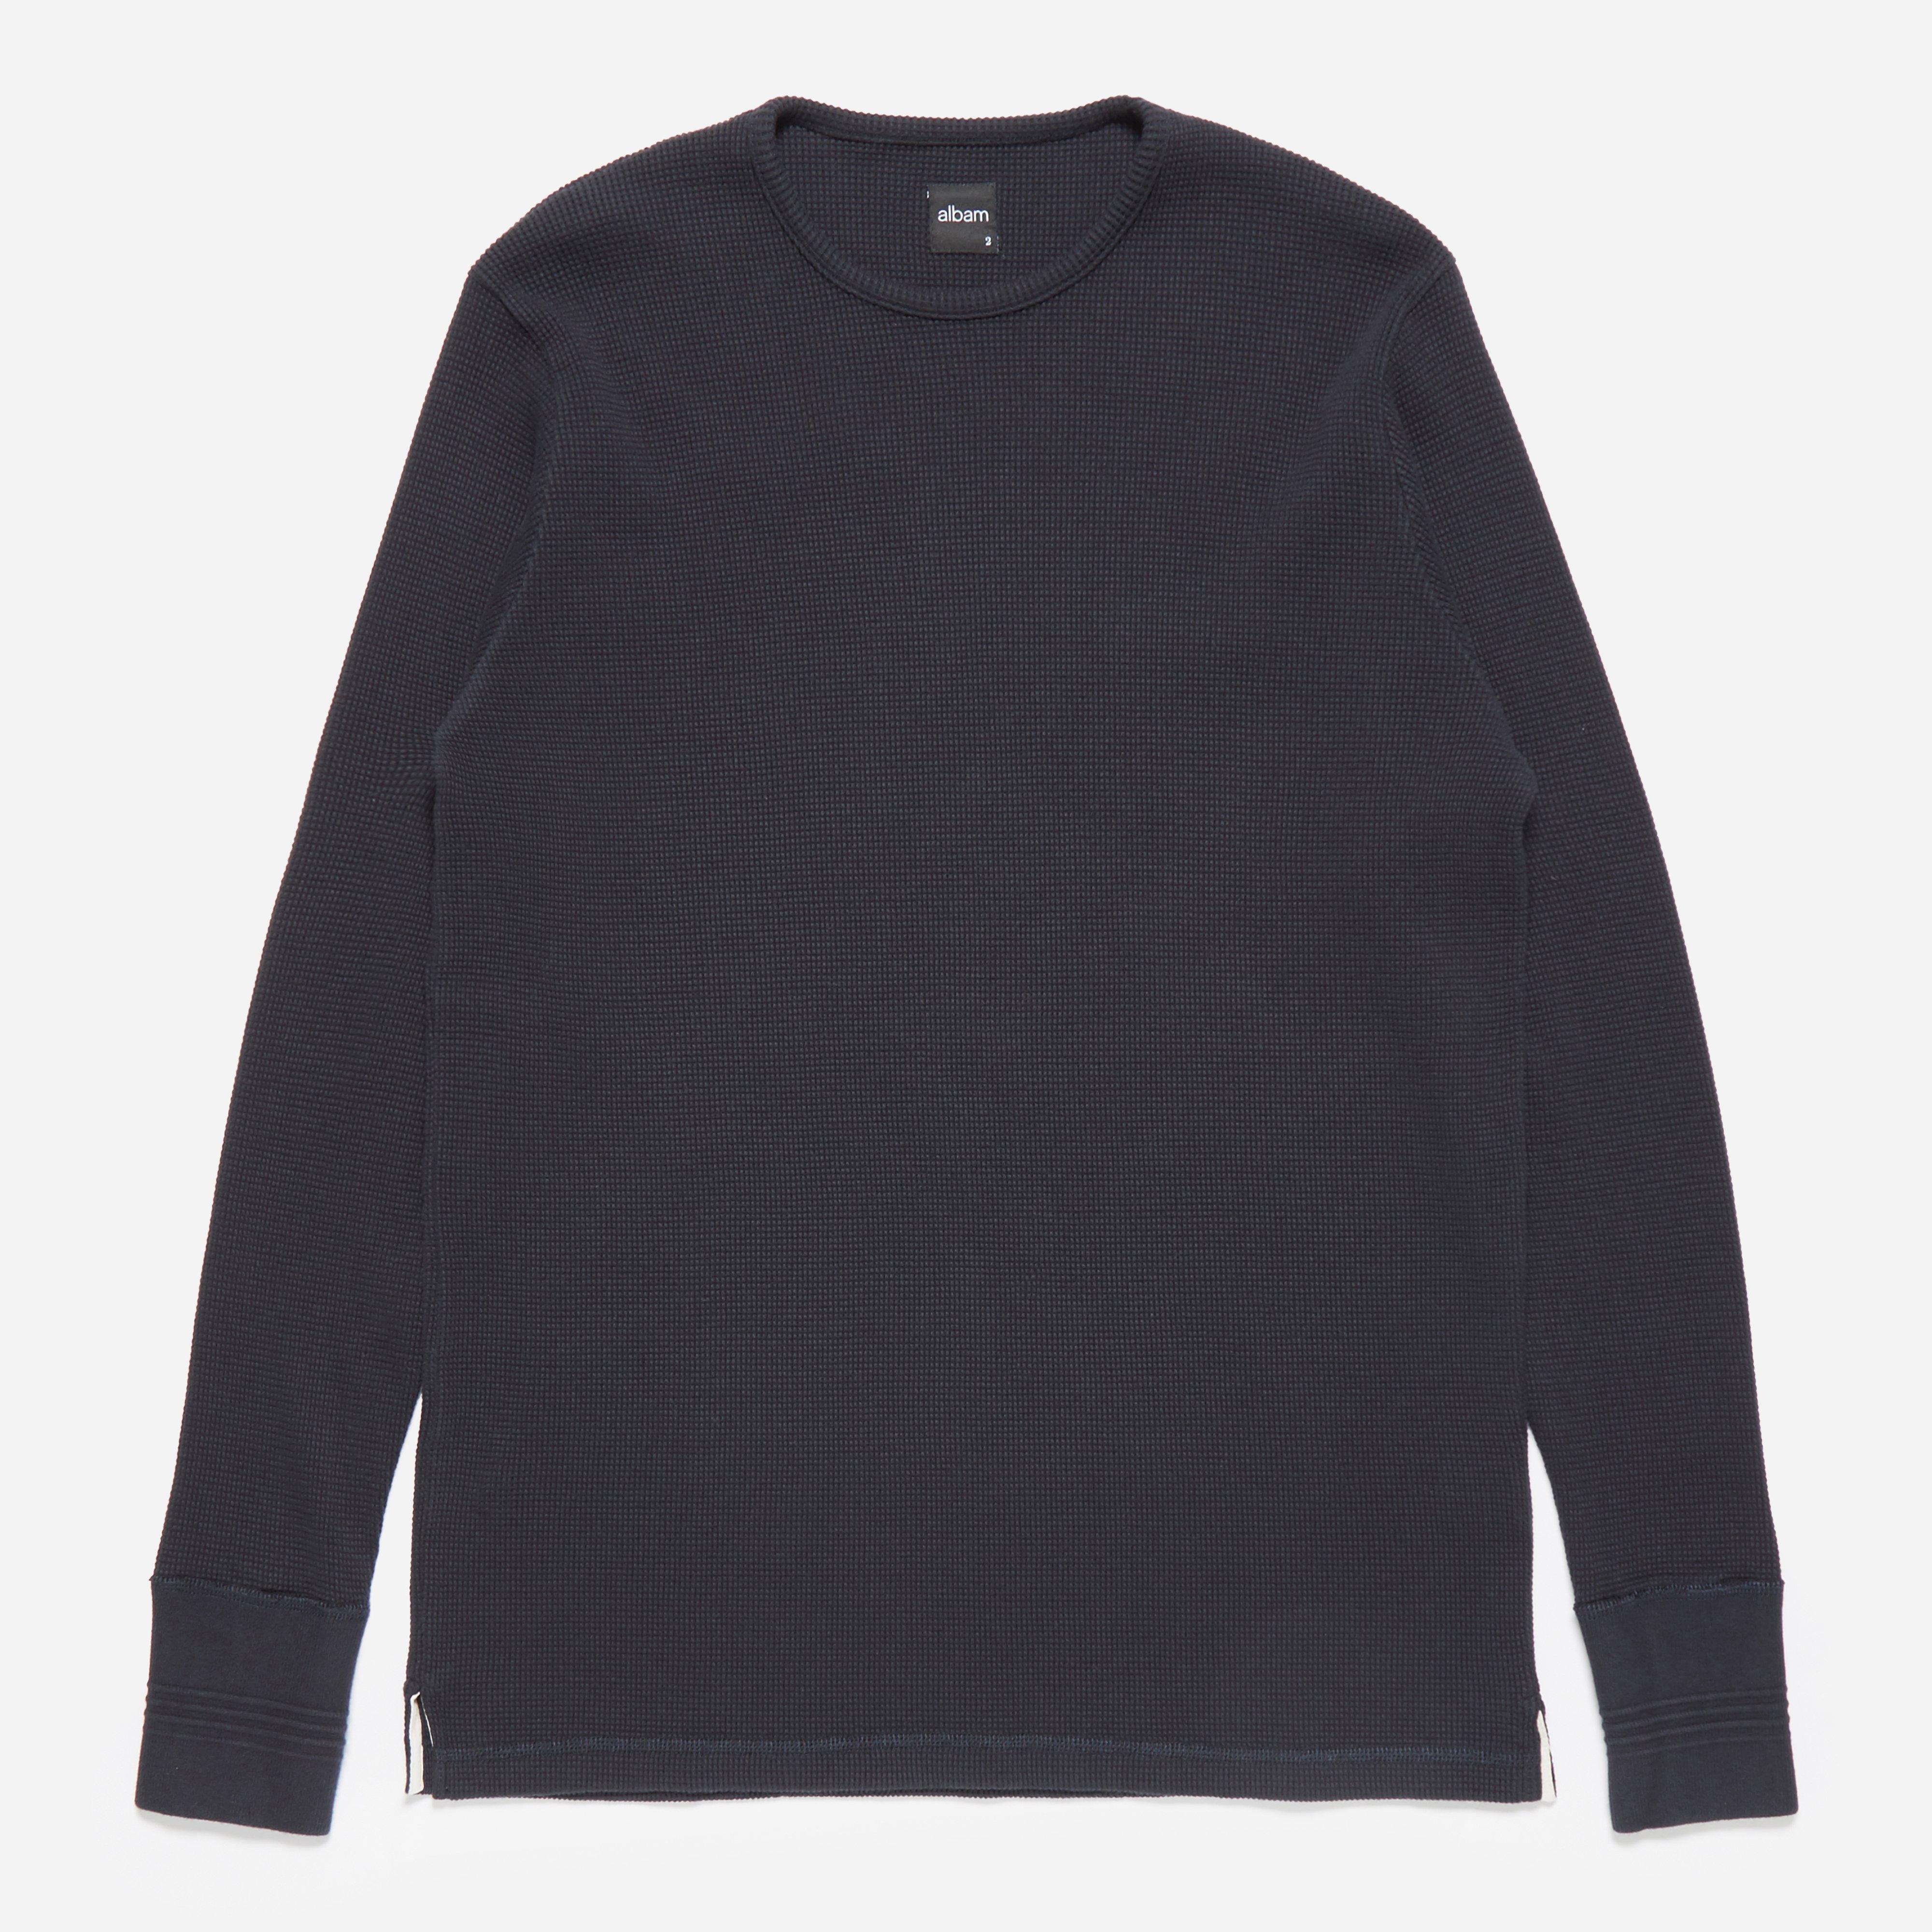 Albam Long Sleeve Waffle T-shirt